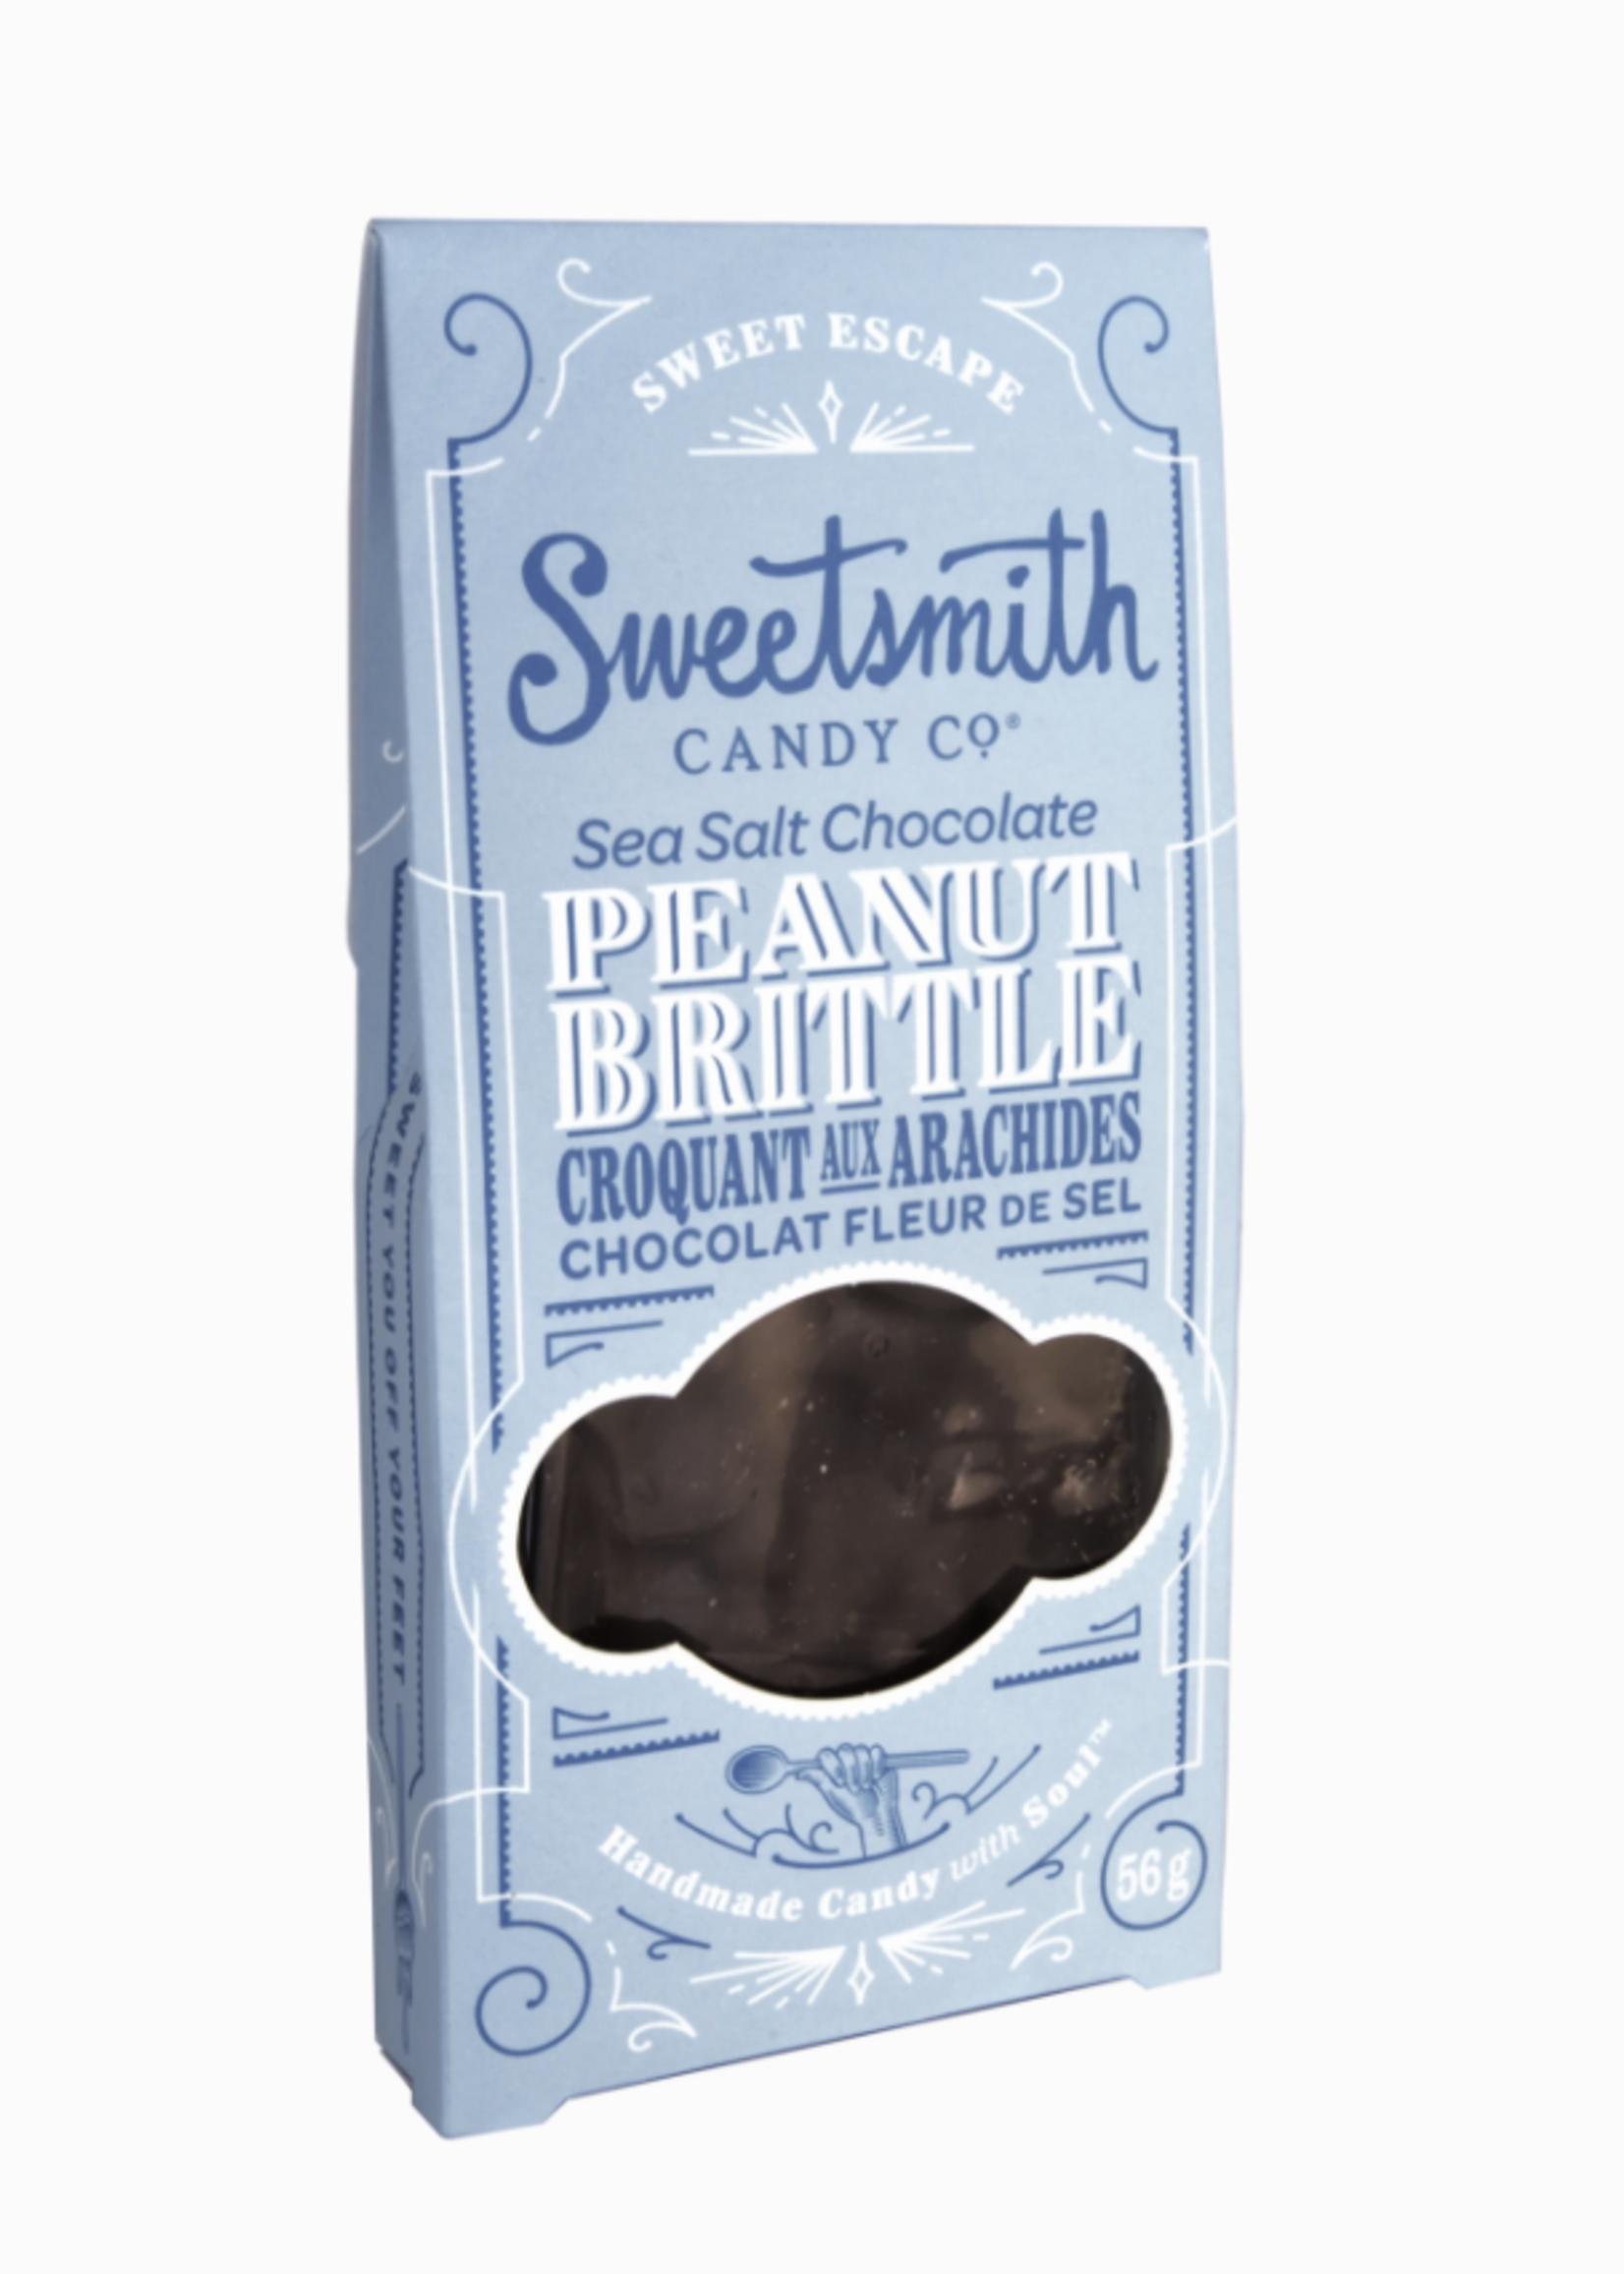 Sweetsmith Candy Co. Sea Salt Chocolate Peanut Brittle